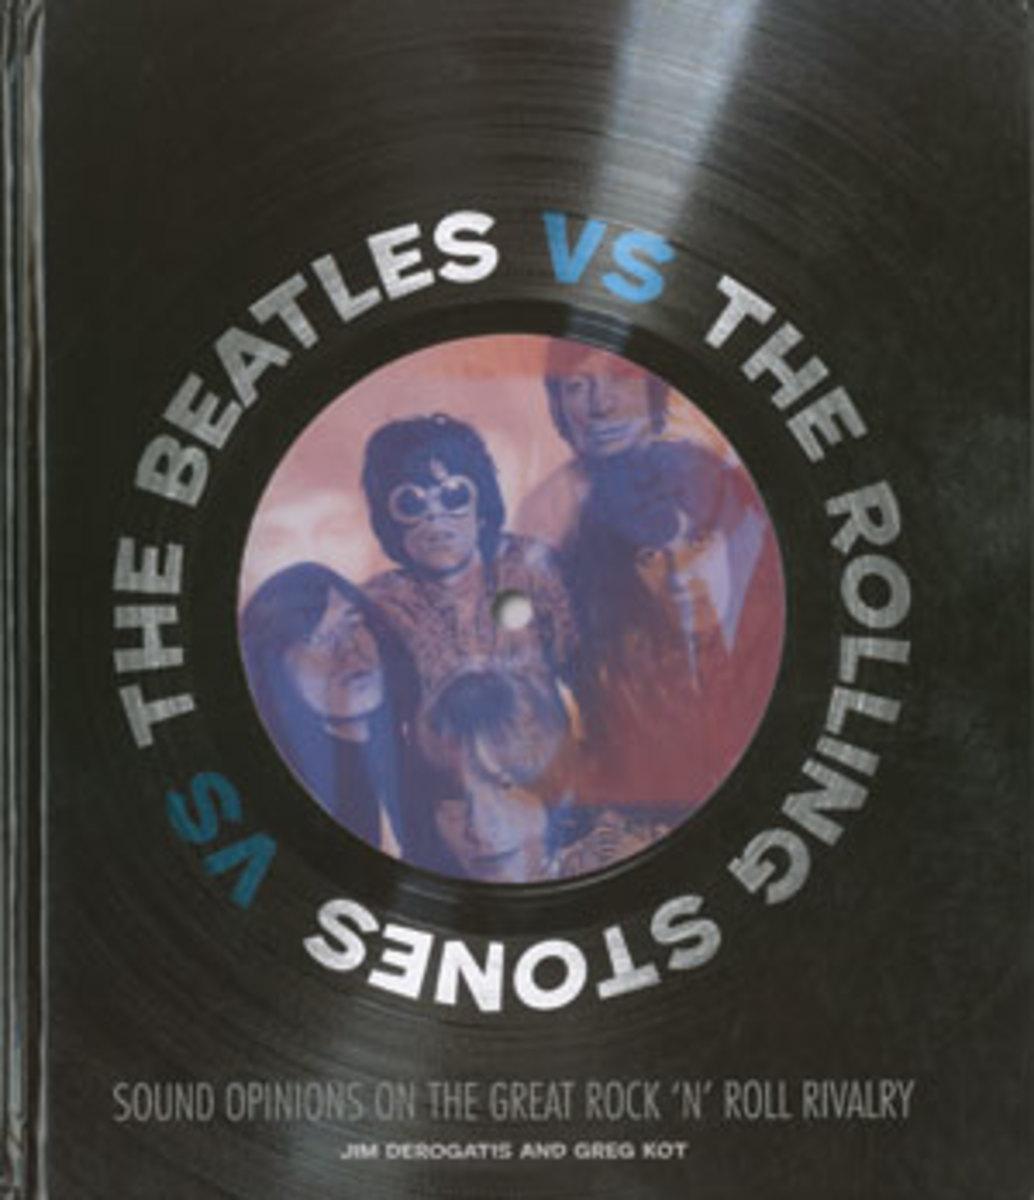 BeatlesVsRollingStones